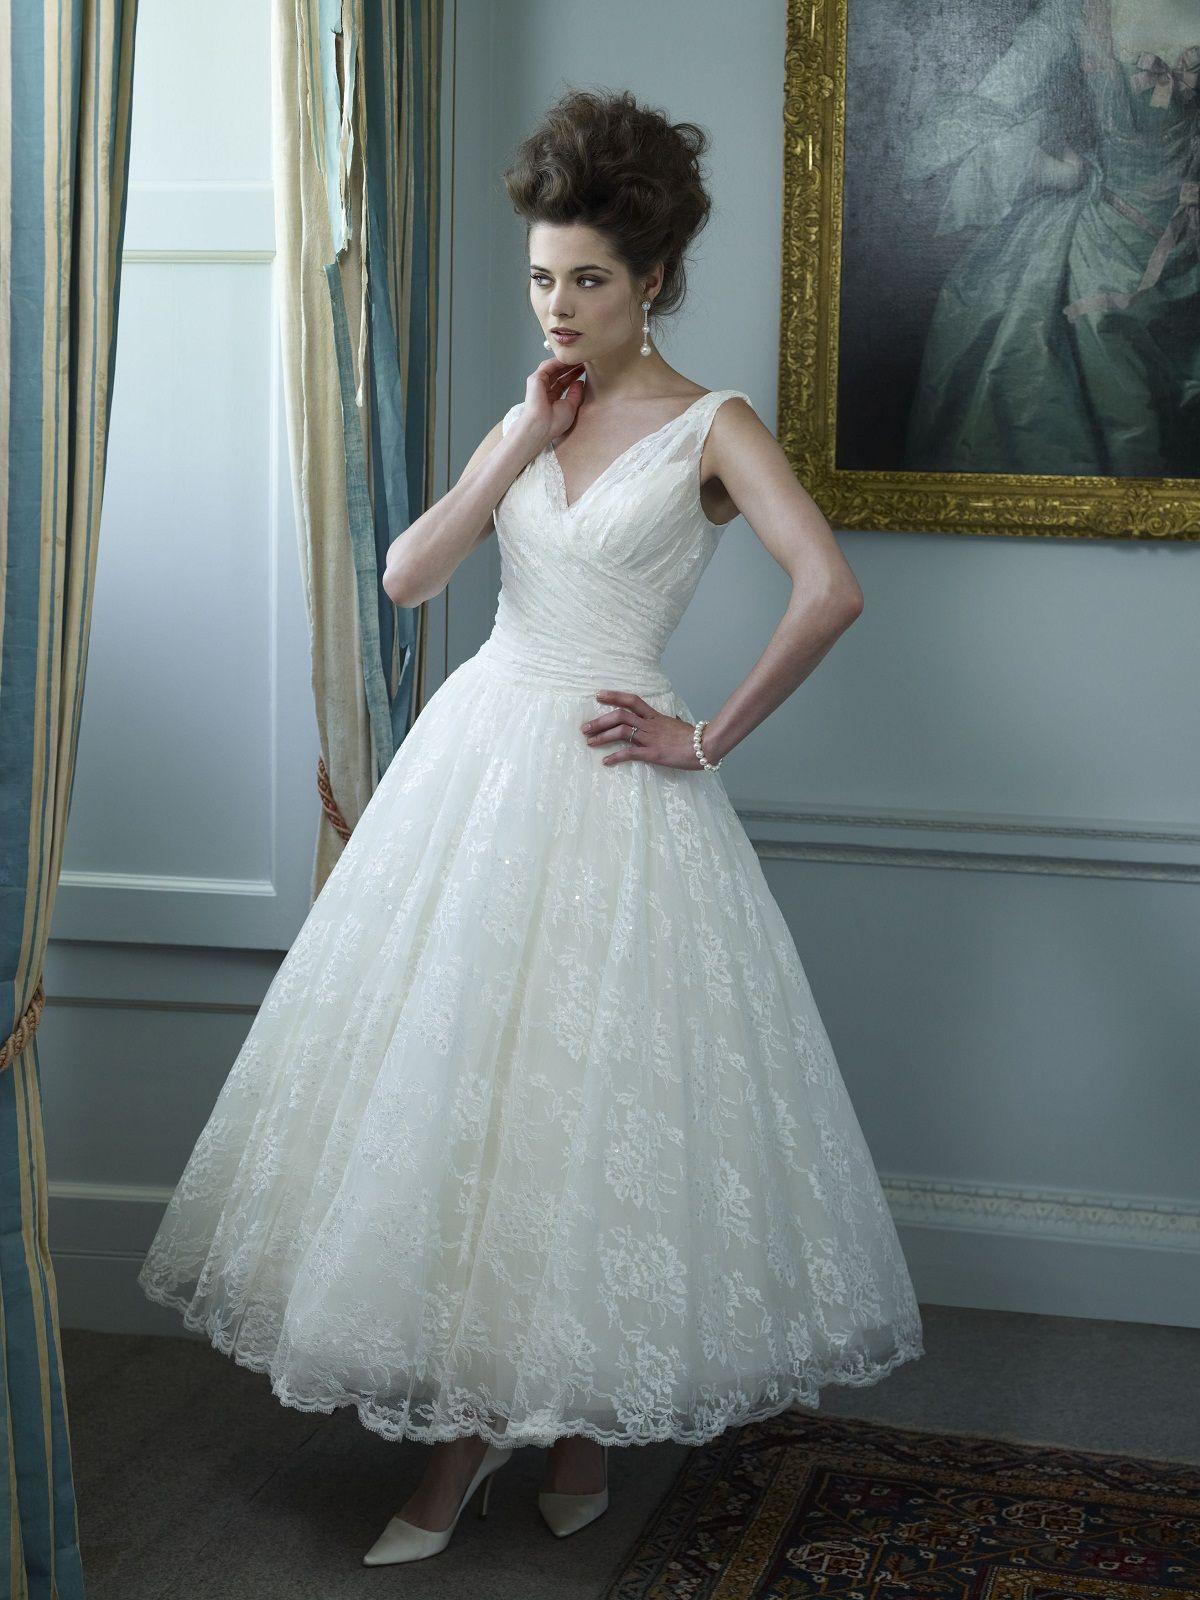 Fein Vestidos De Novia Rocieros Bilder - Brautkleider Ideen ...